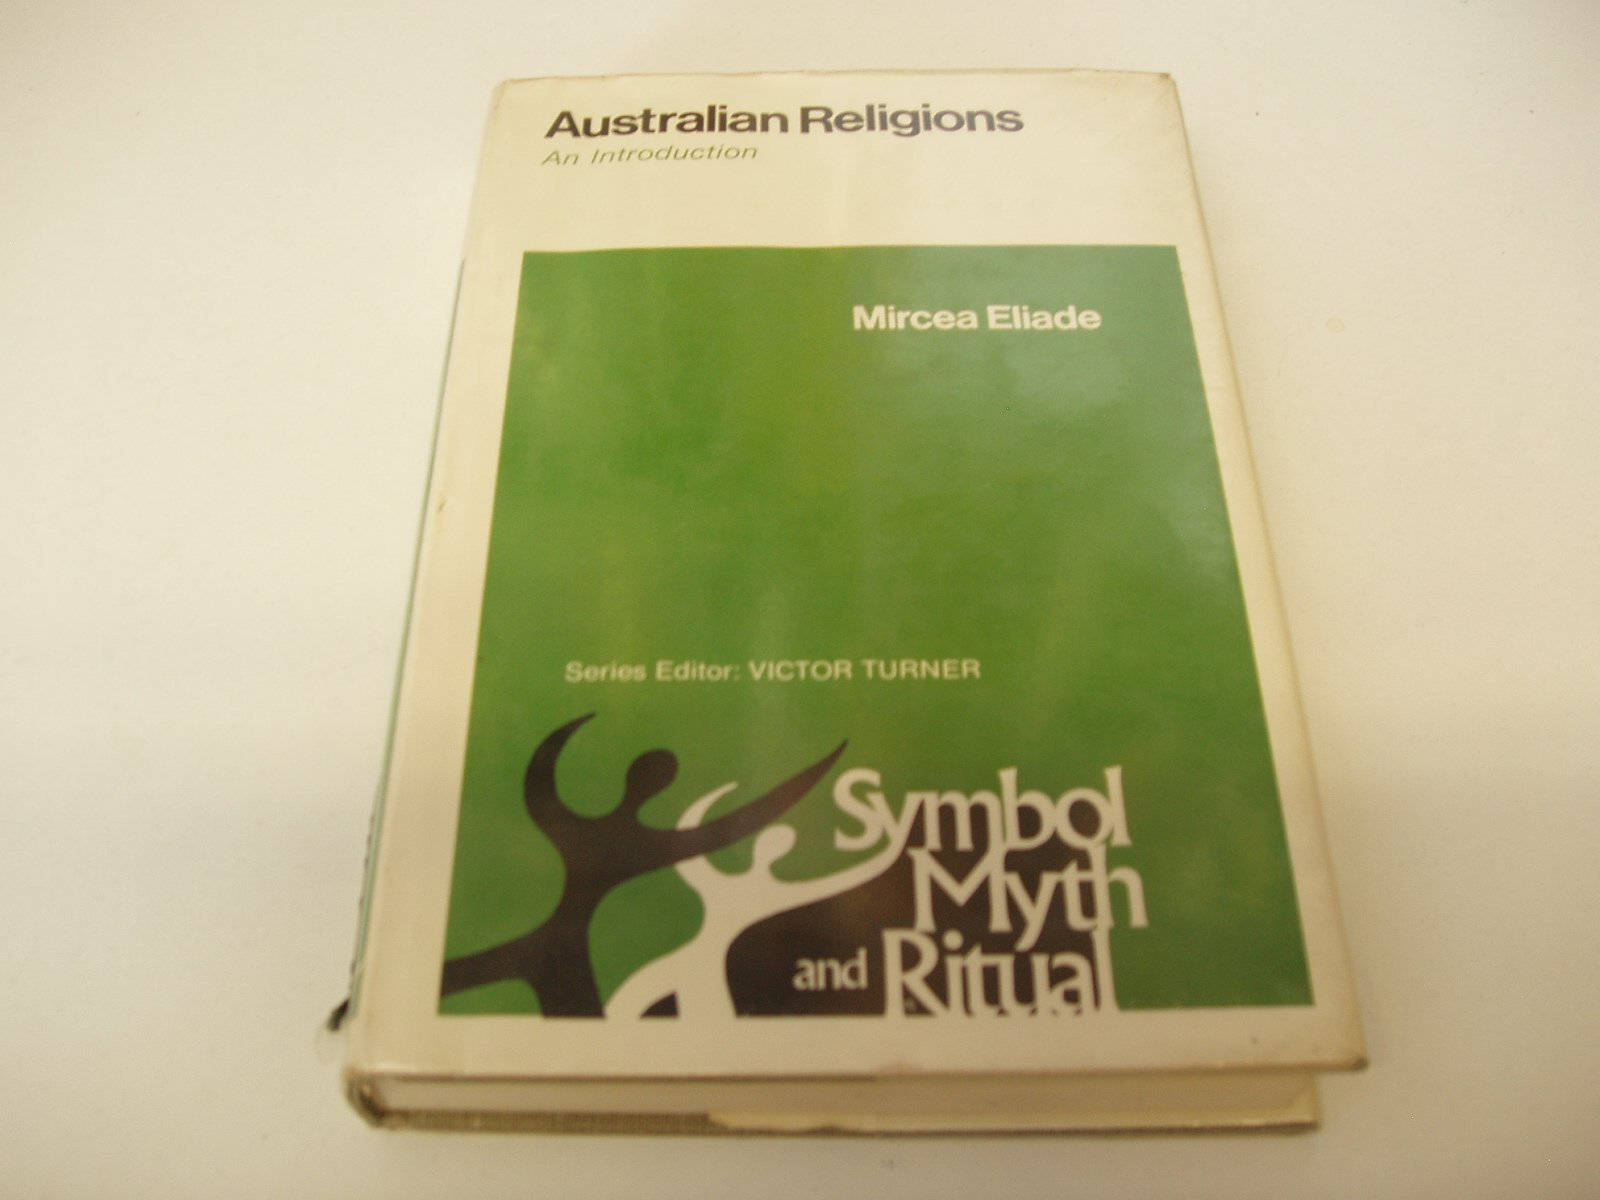 Australian religions an introduction symbol myth and ritual australian religions an introduction symbol myth and ritual mircea eliade 9780801407291 amazon books buycottarizona